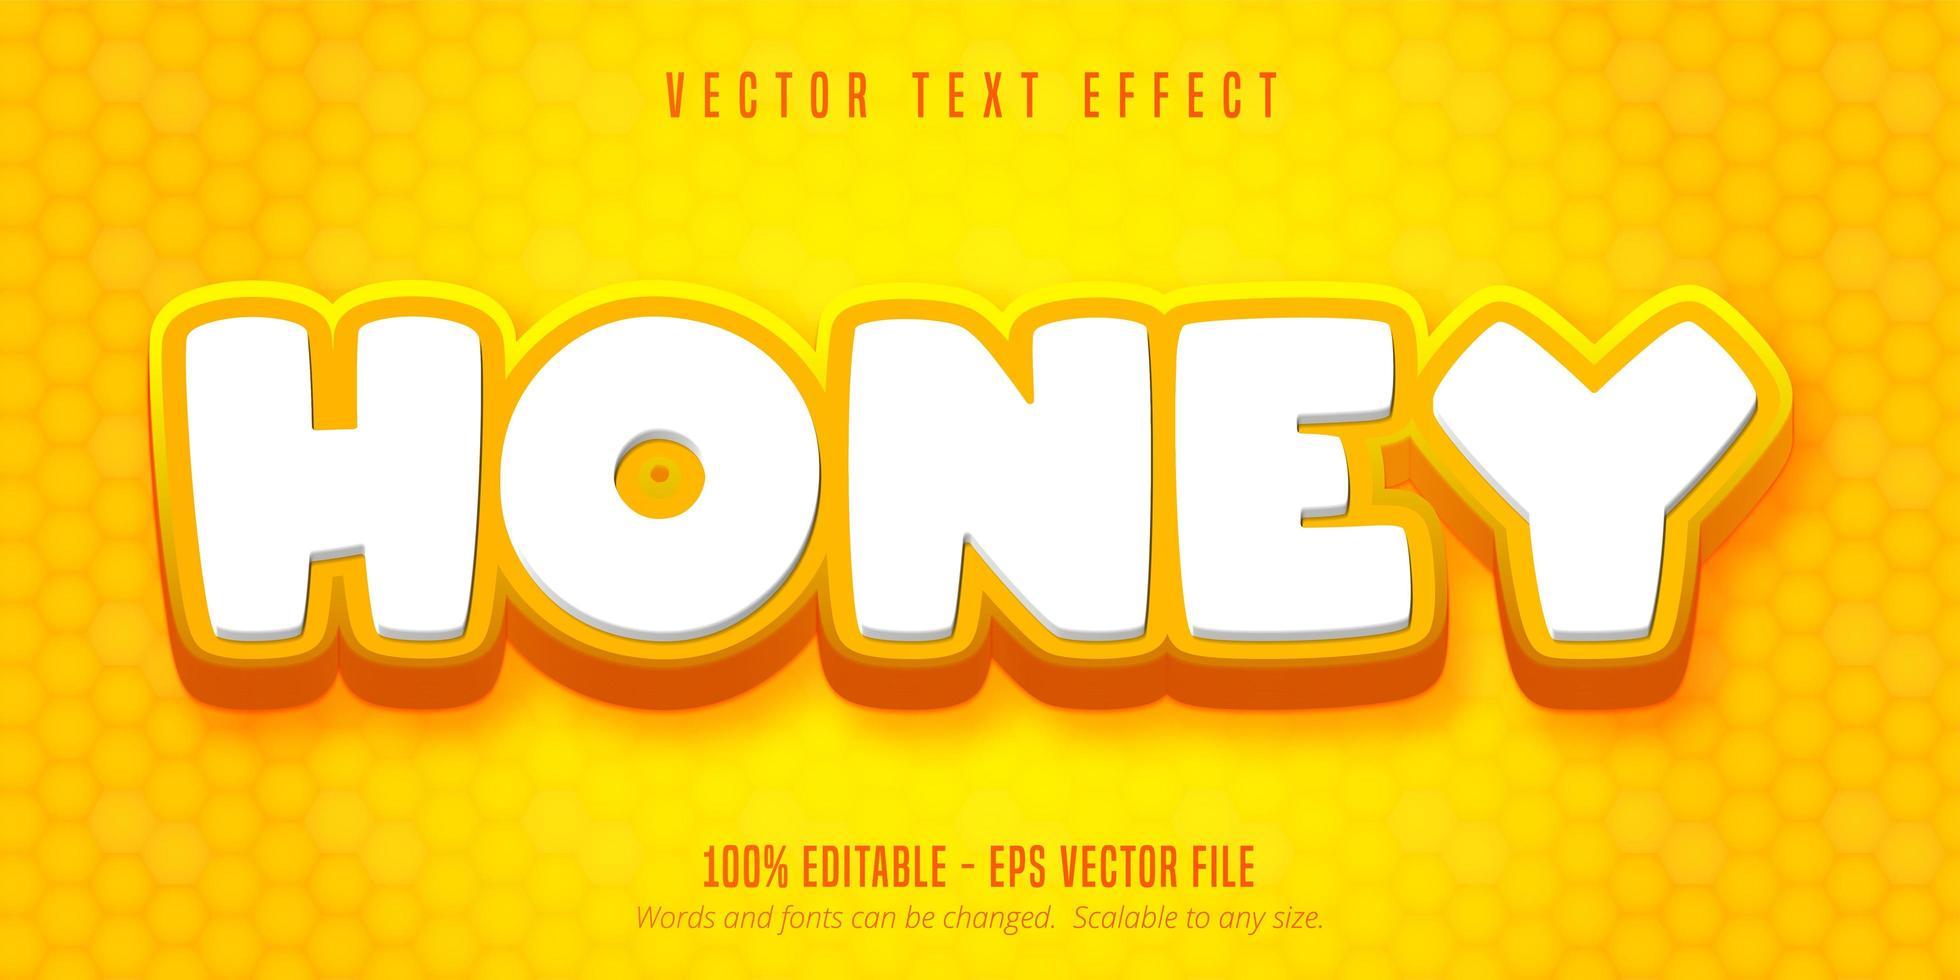 texte de miel, effet de texte de style dessin animé vecteur